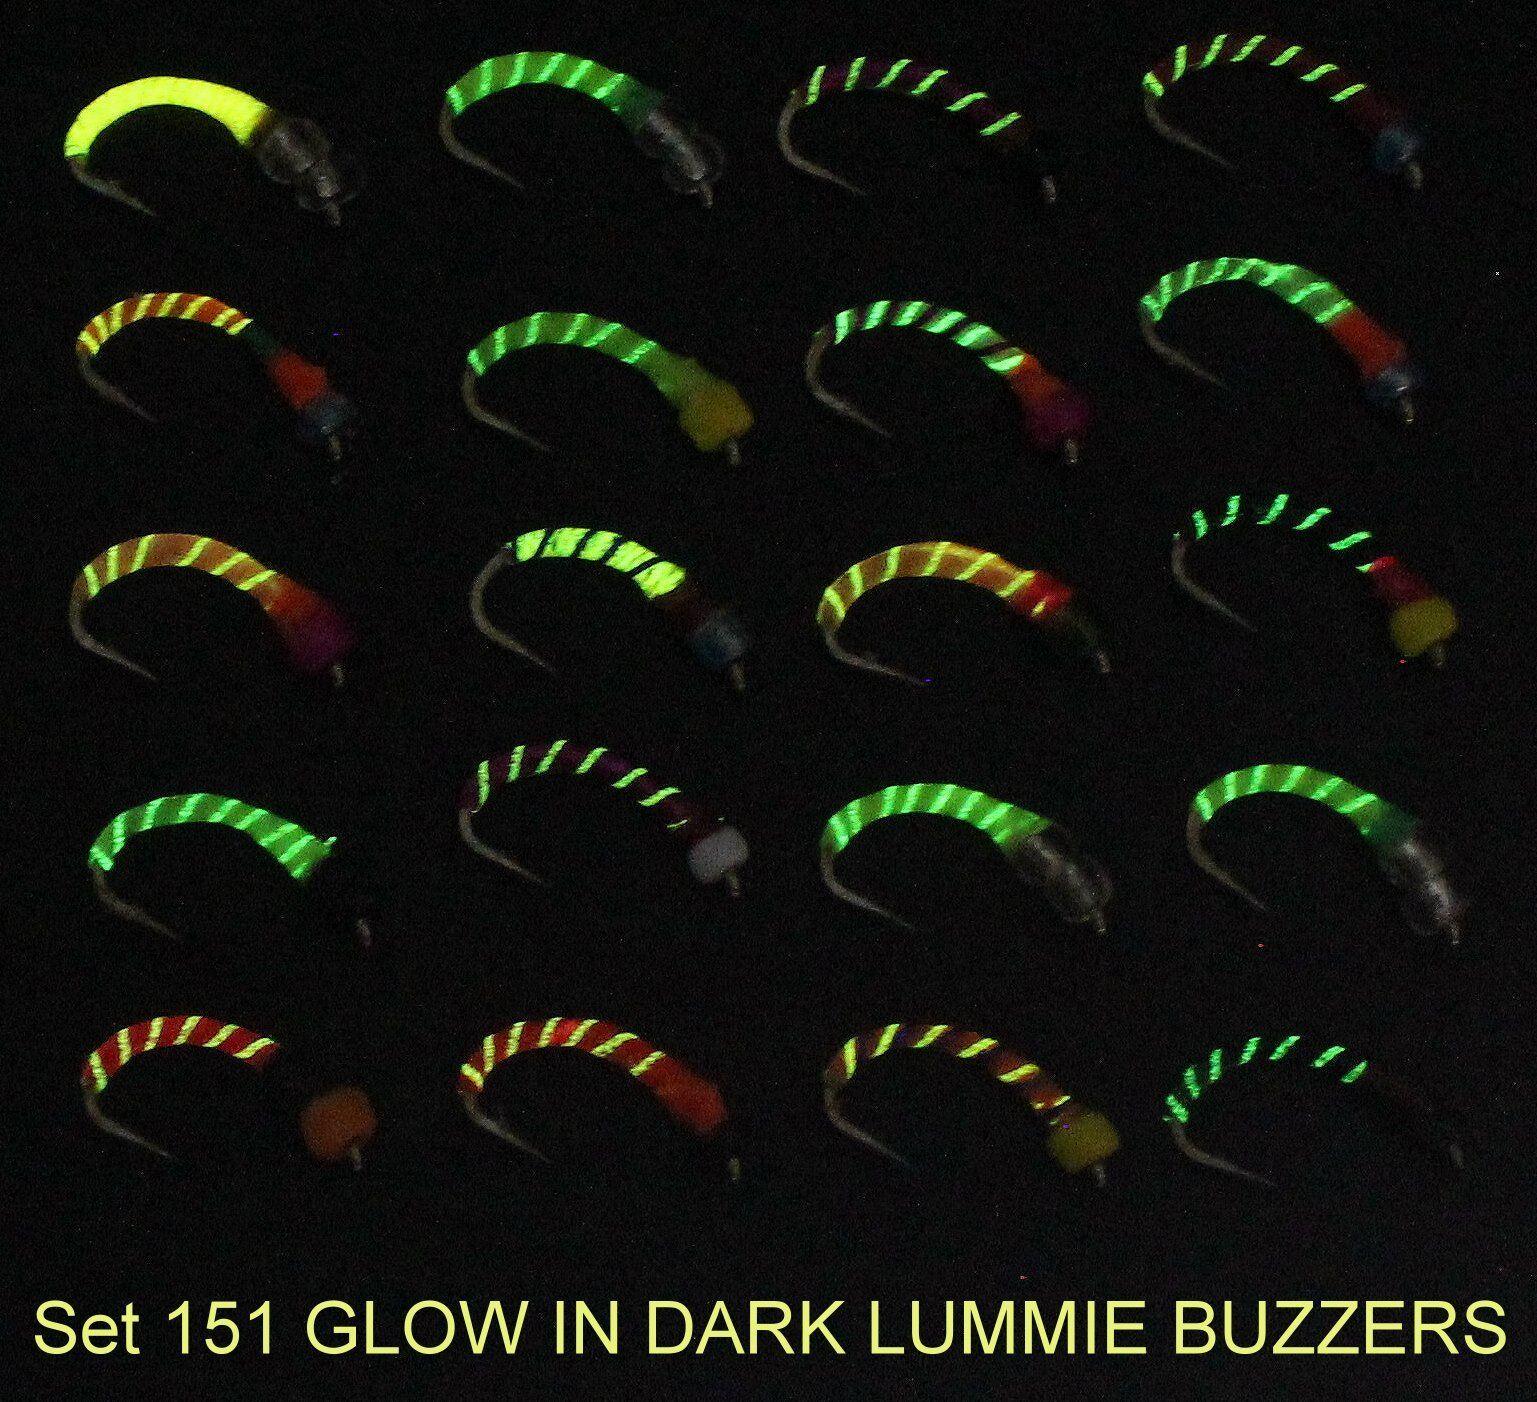 TRUITES MOUCHES Glow époxy Buzzers Truite Pêche Mouches à La Mouche Mouches Pêche Set 151-10 pour Rod Reel 1b5a7c